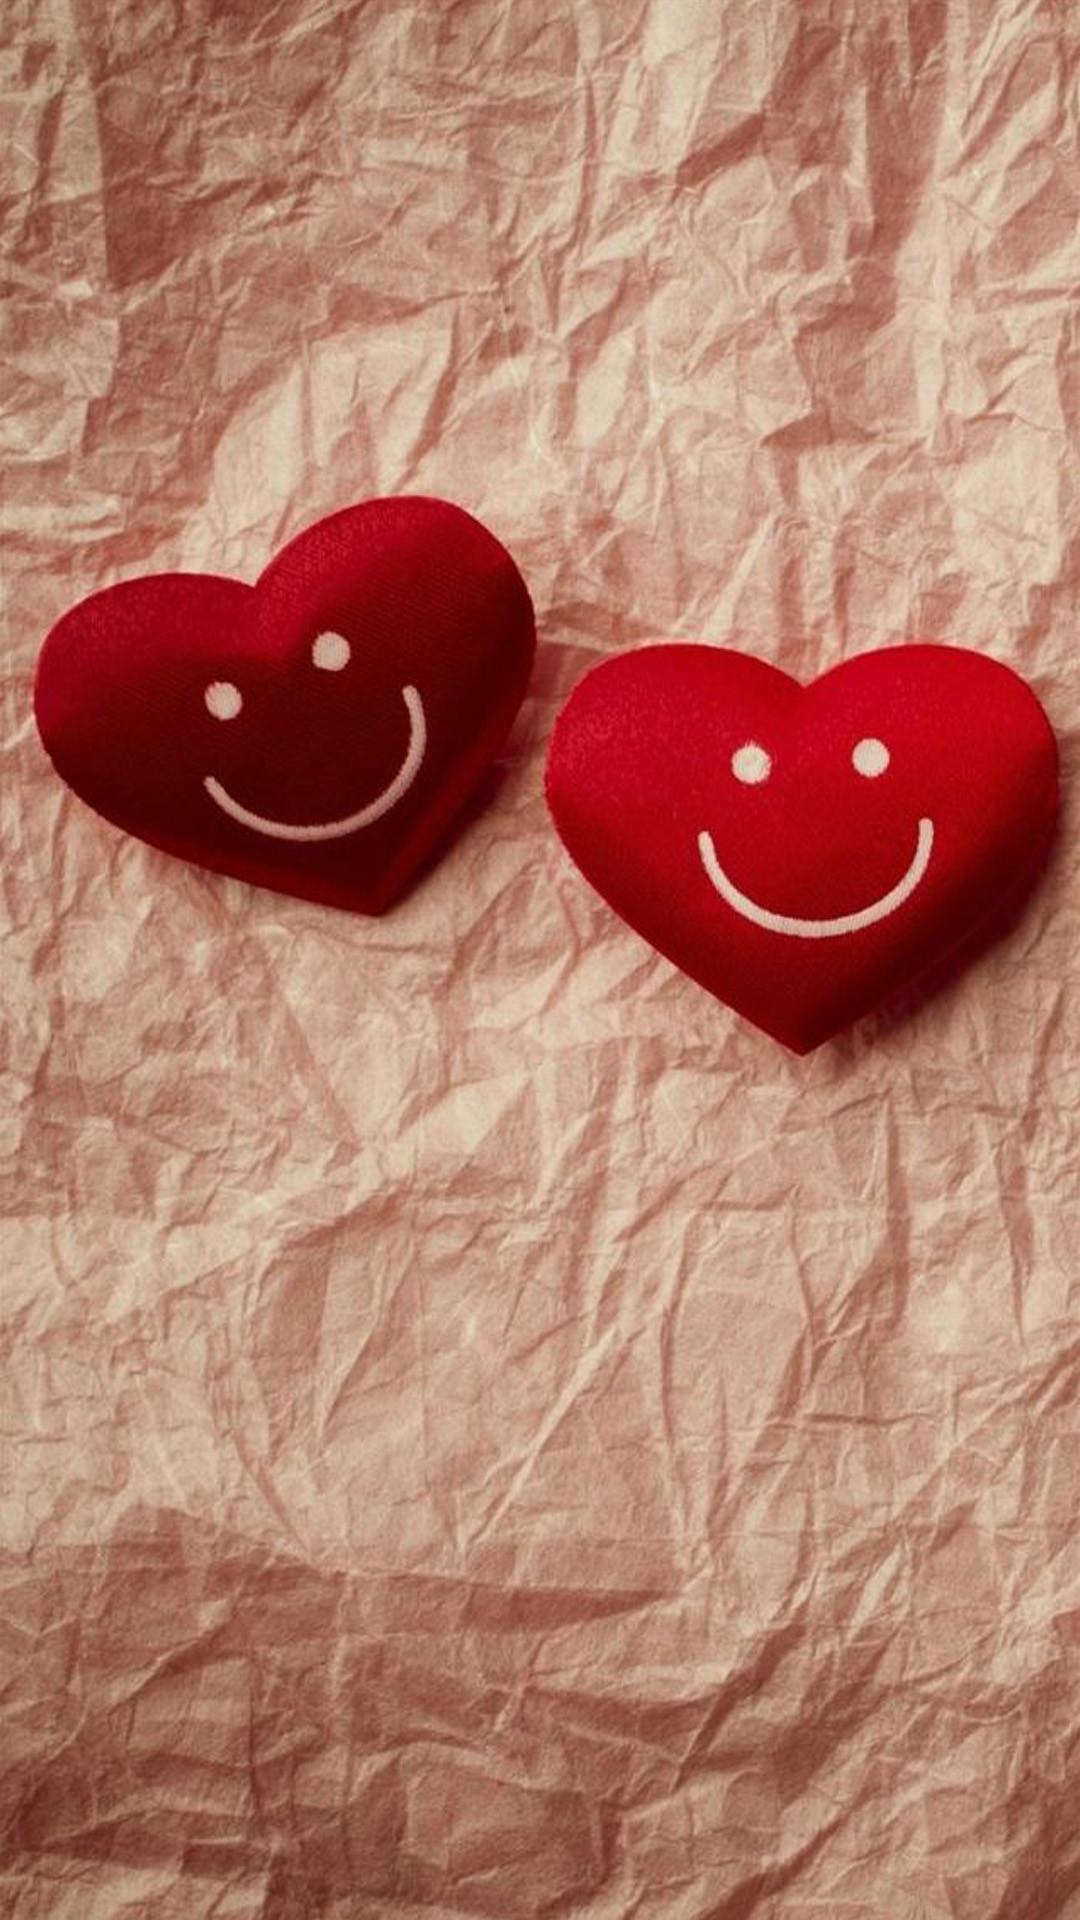 Cute Smile Girl Hd Wallpaper Cute Heart Wallpaper 59 Images